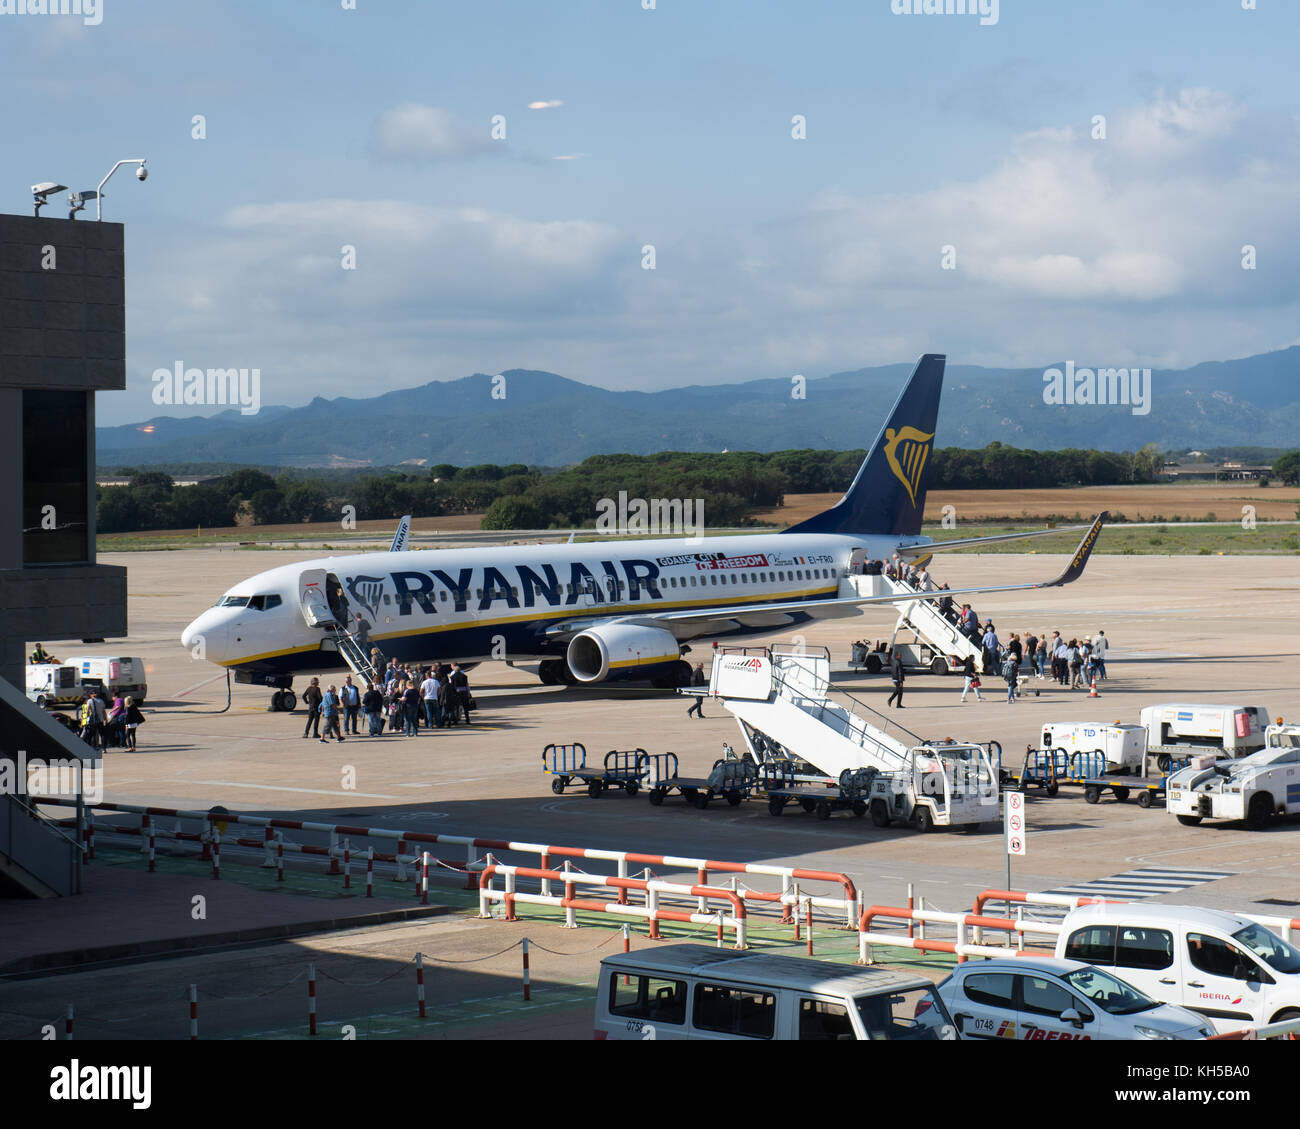 Ryanair flights at Girona Airport, Spain - Stock Image